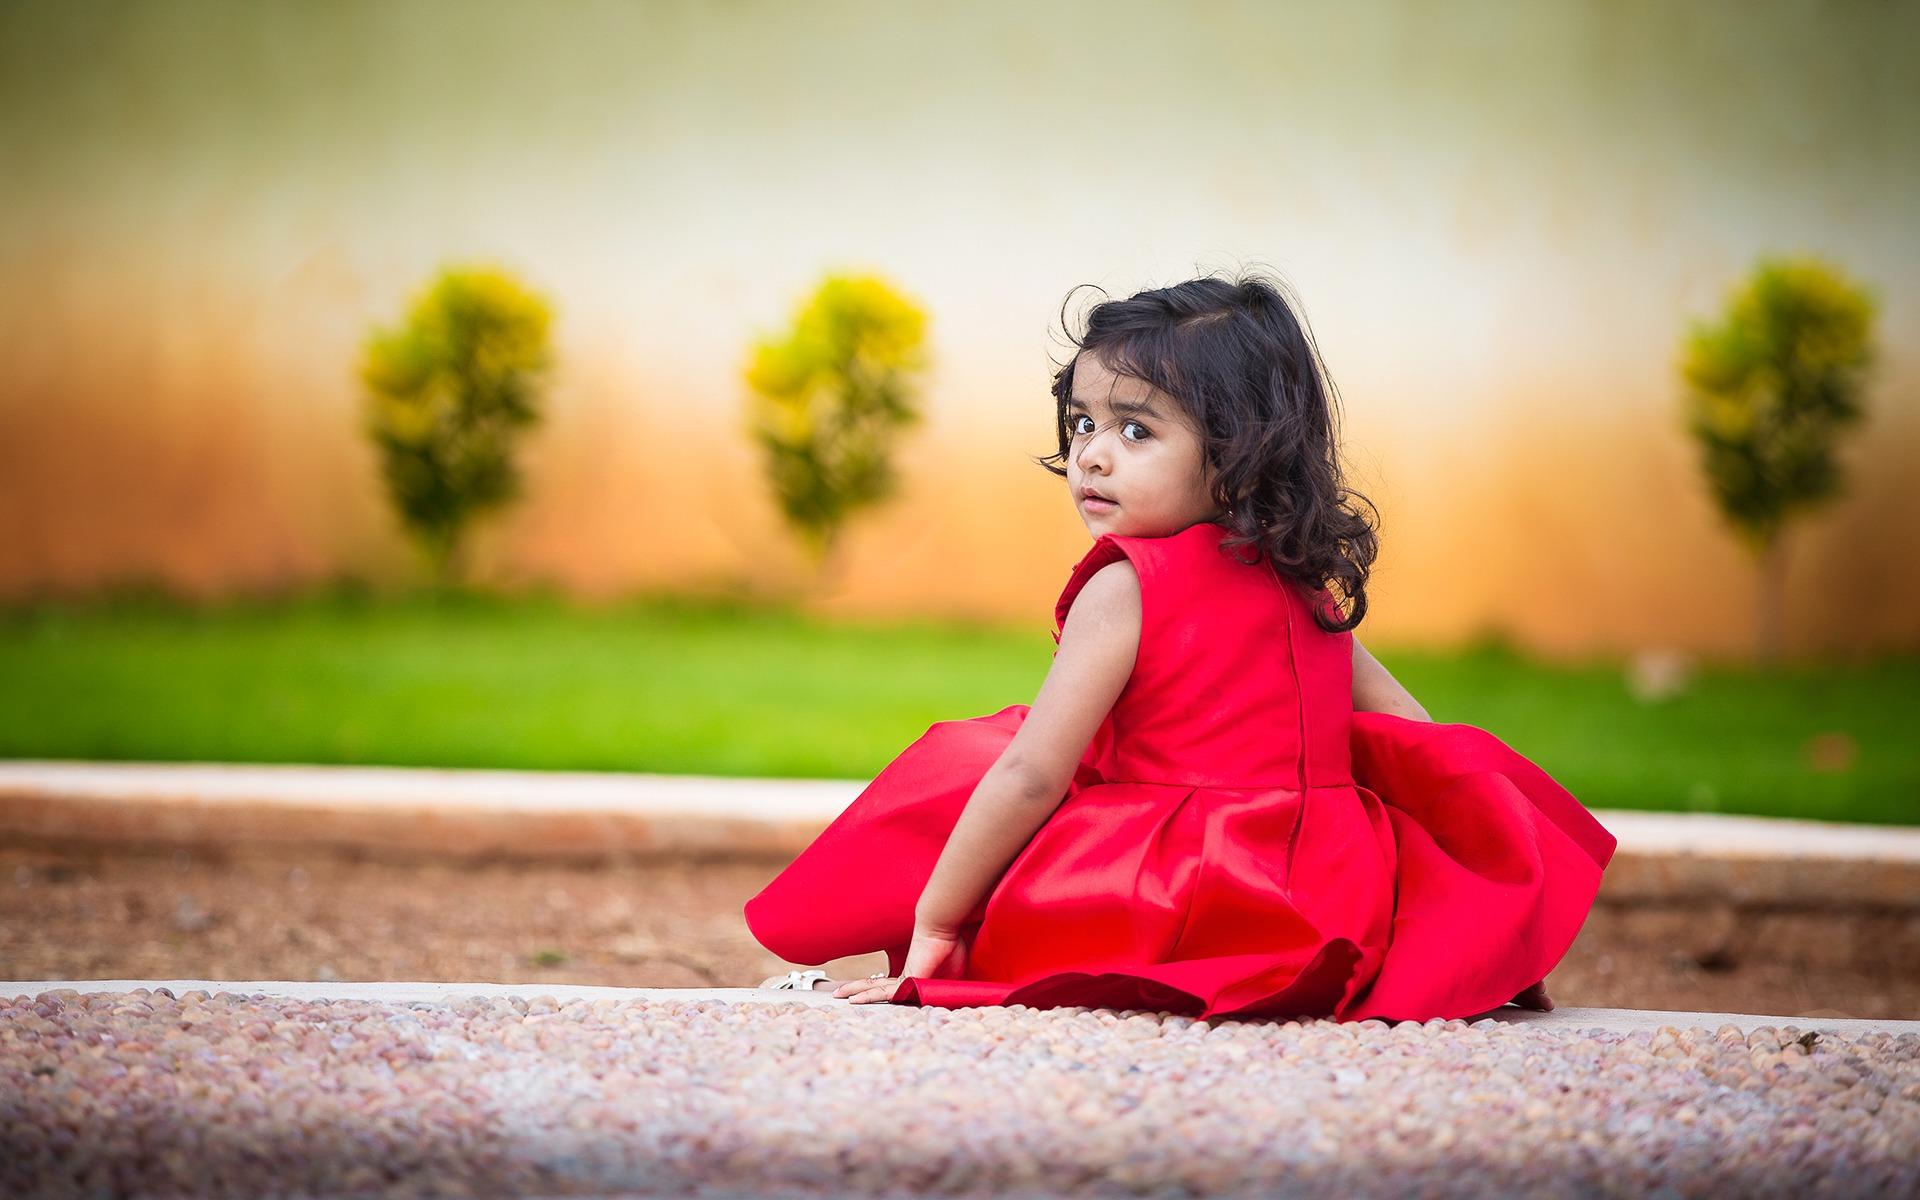 Kids photoshoot between 1 to 3 years of age in Delhi | Vinus Images